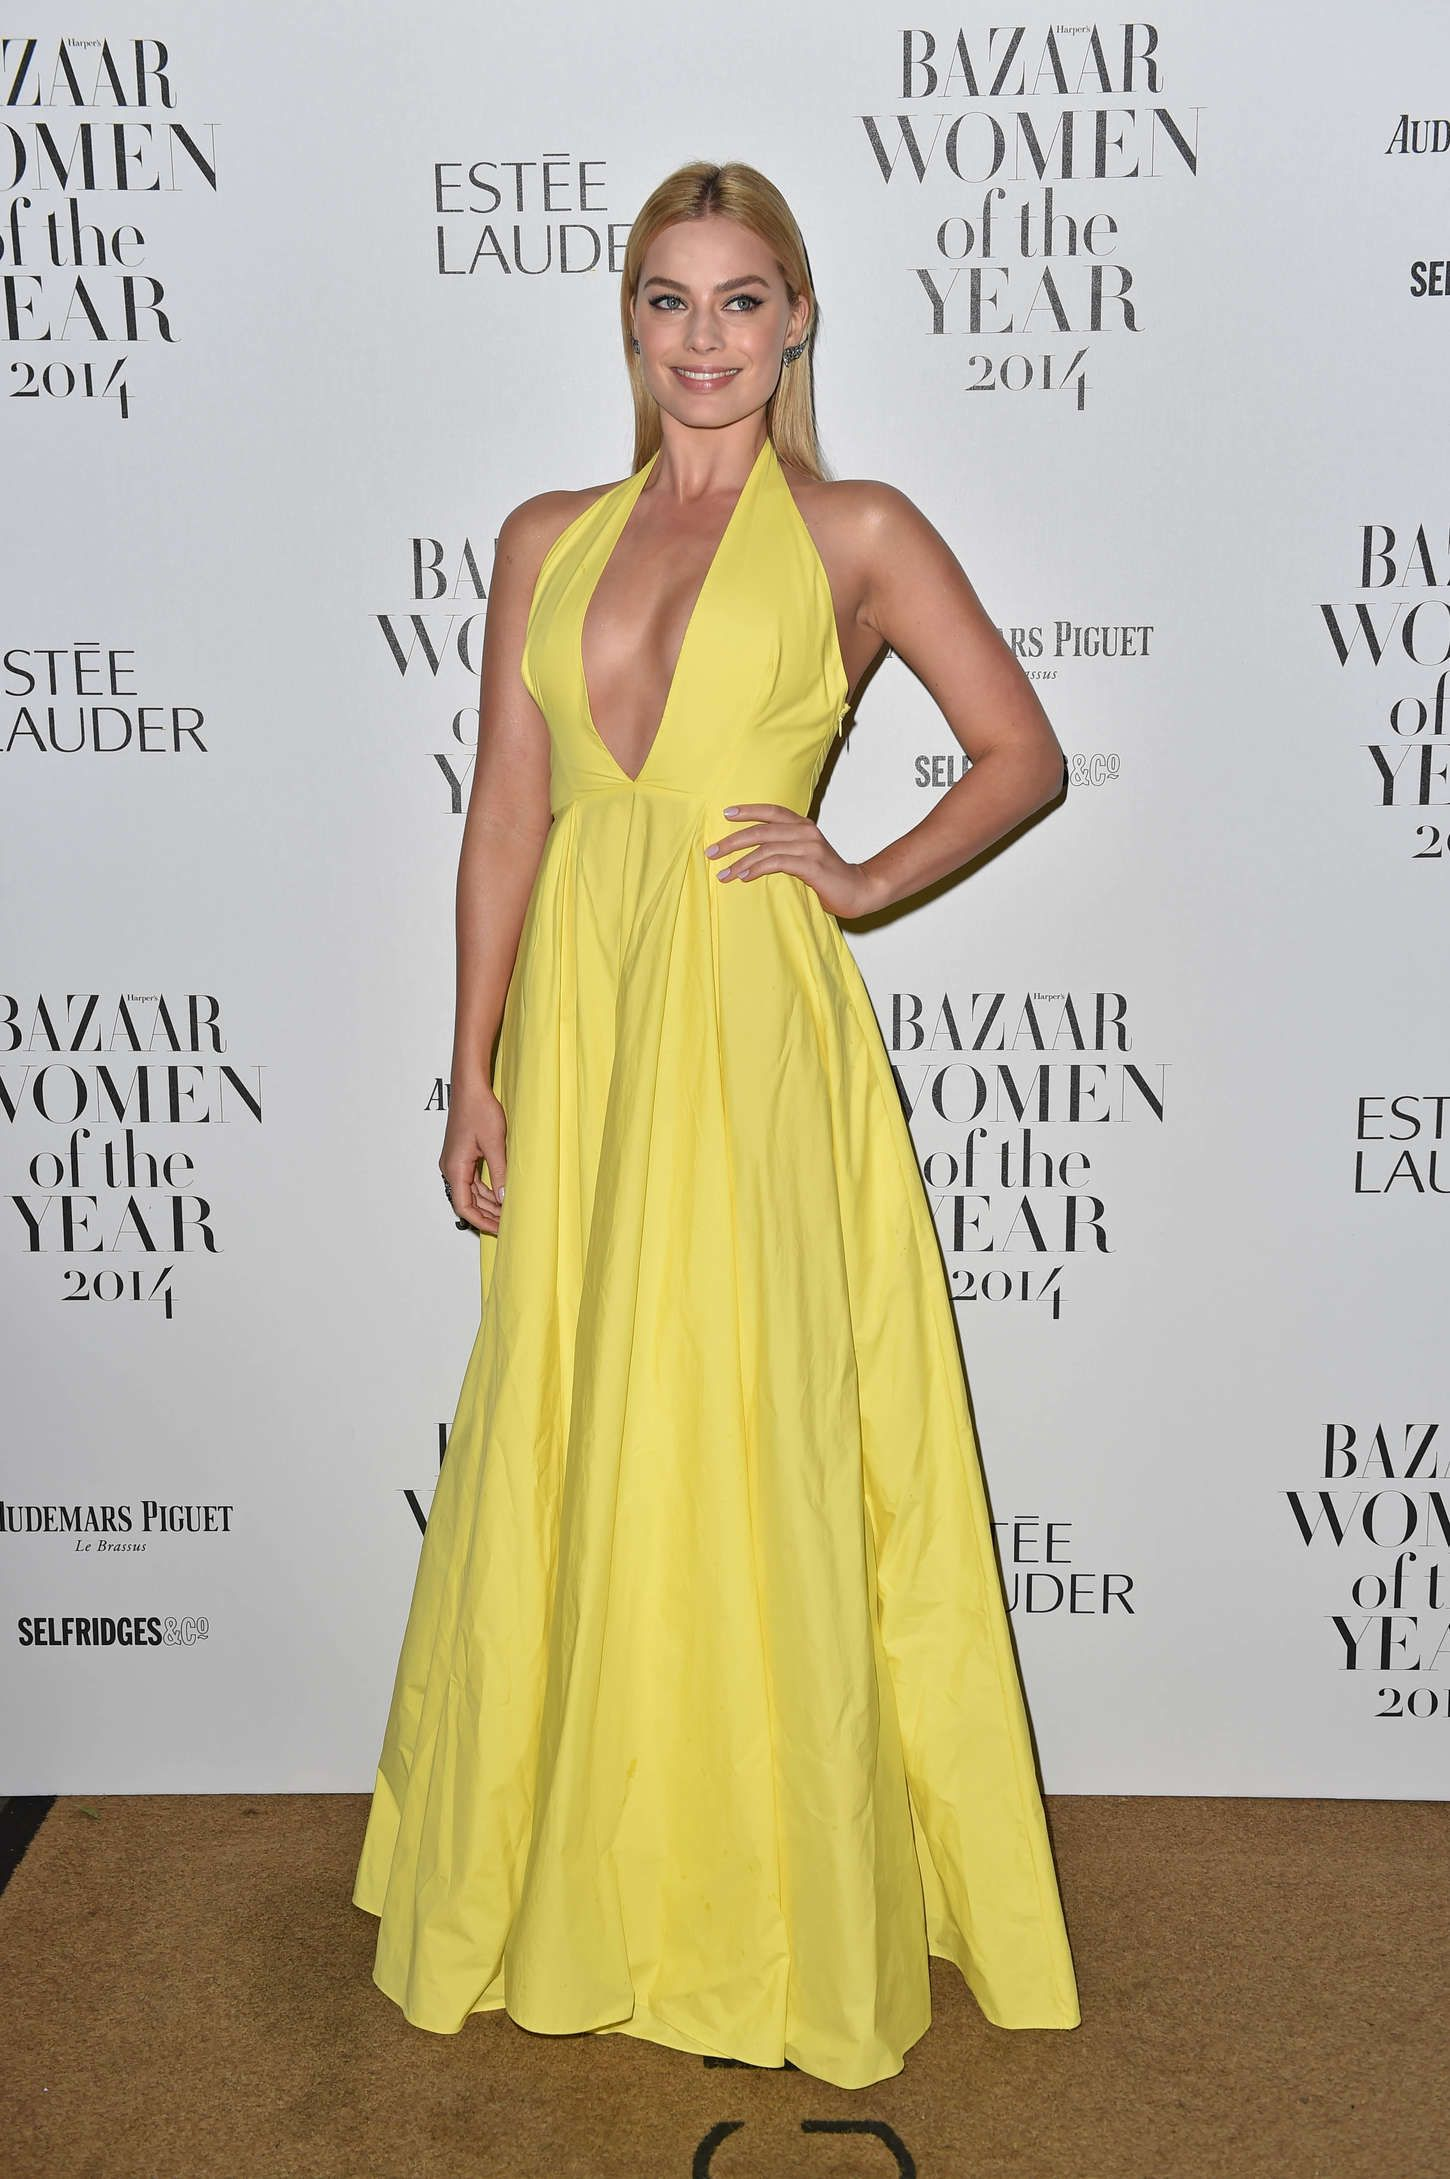 Margot robbie u harperus bazaar women of the year awards in london